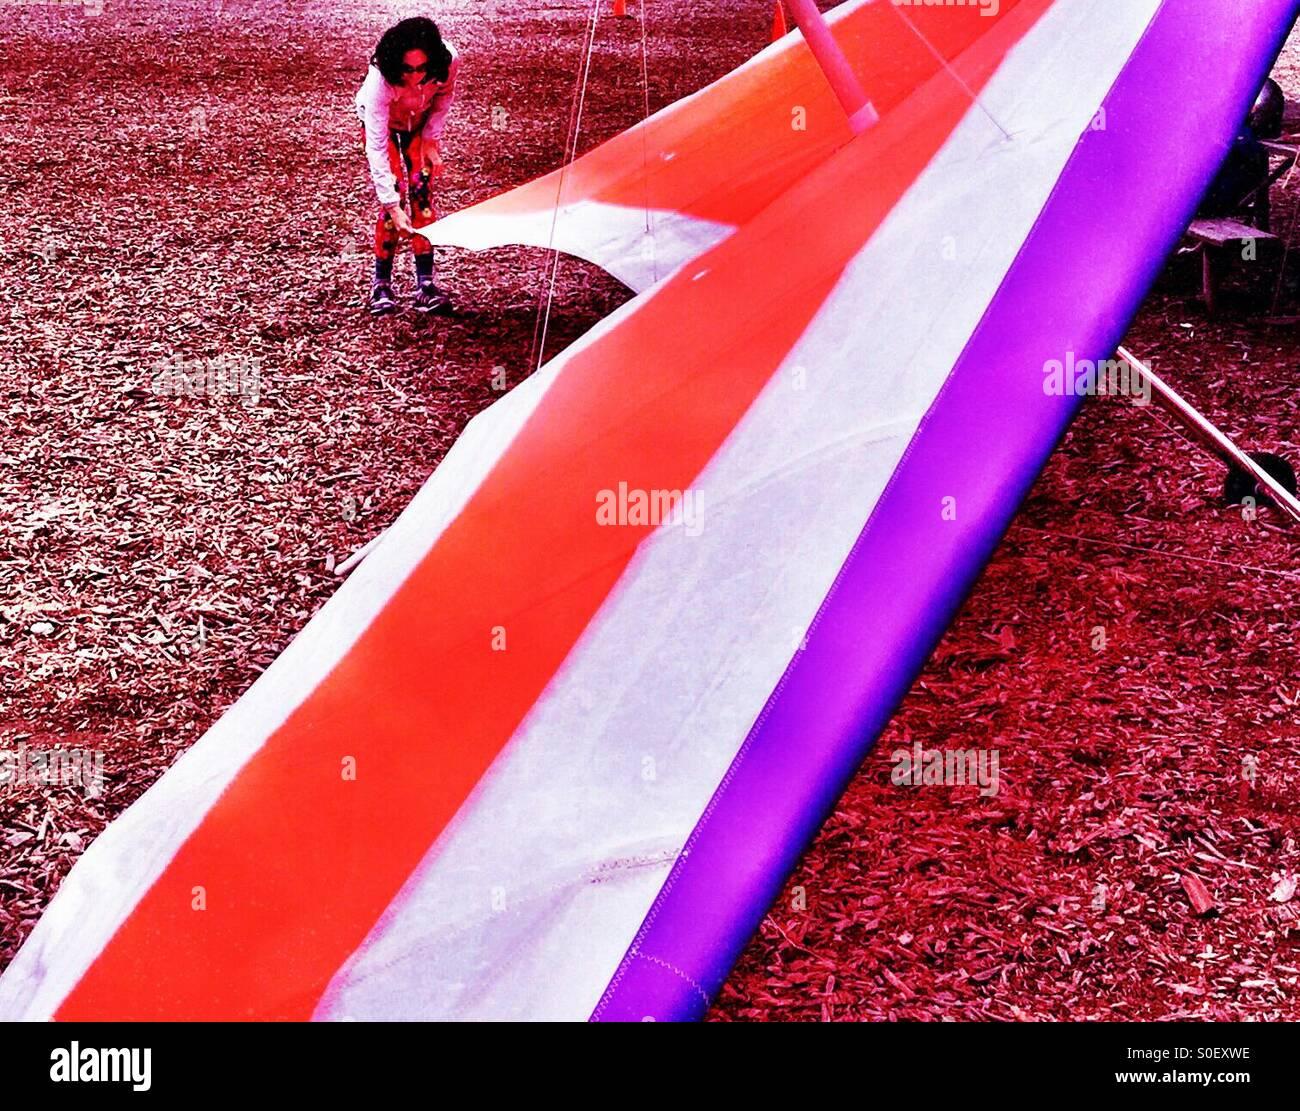 Young woman hang glider preflight rig check in Northern California - Stock Image